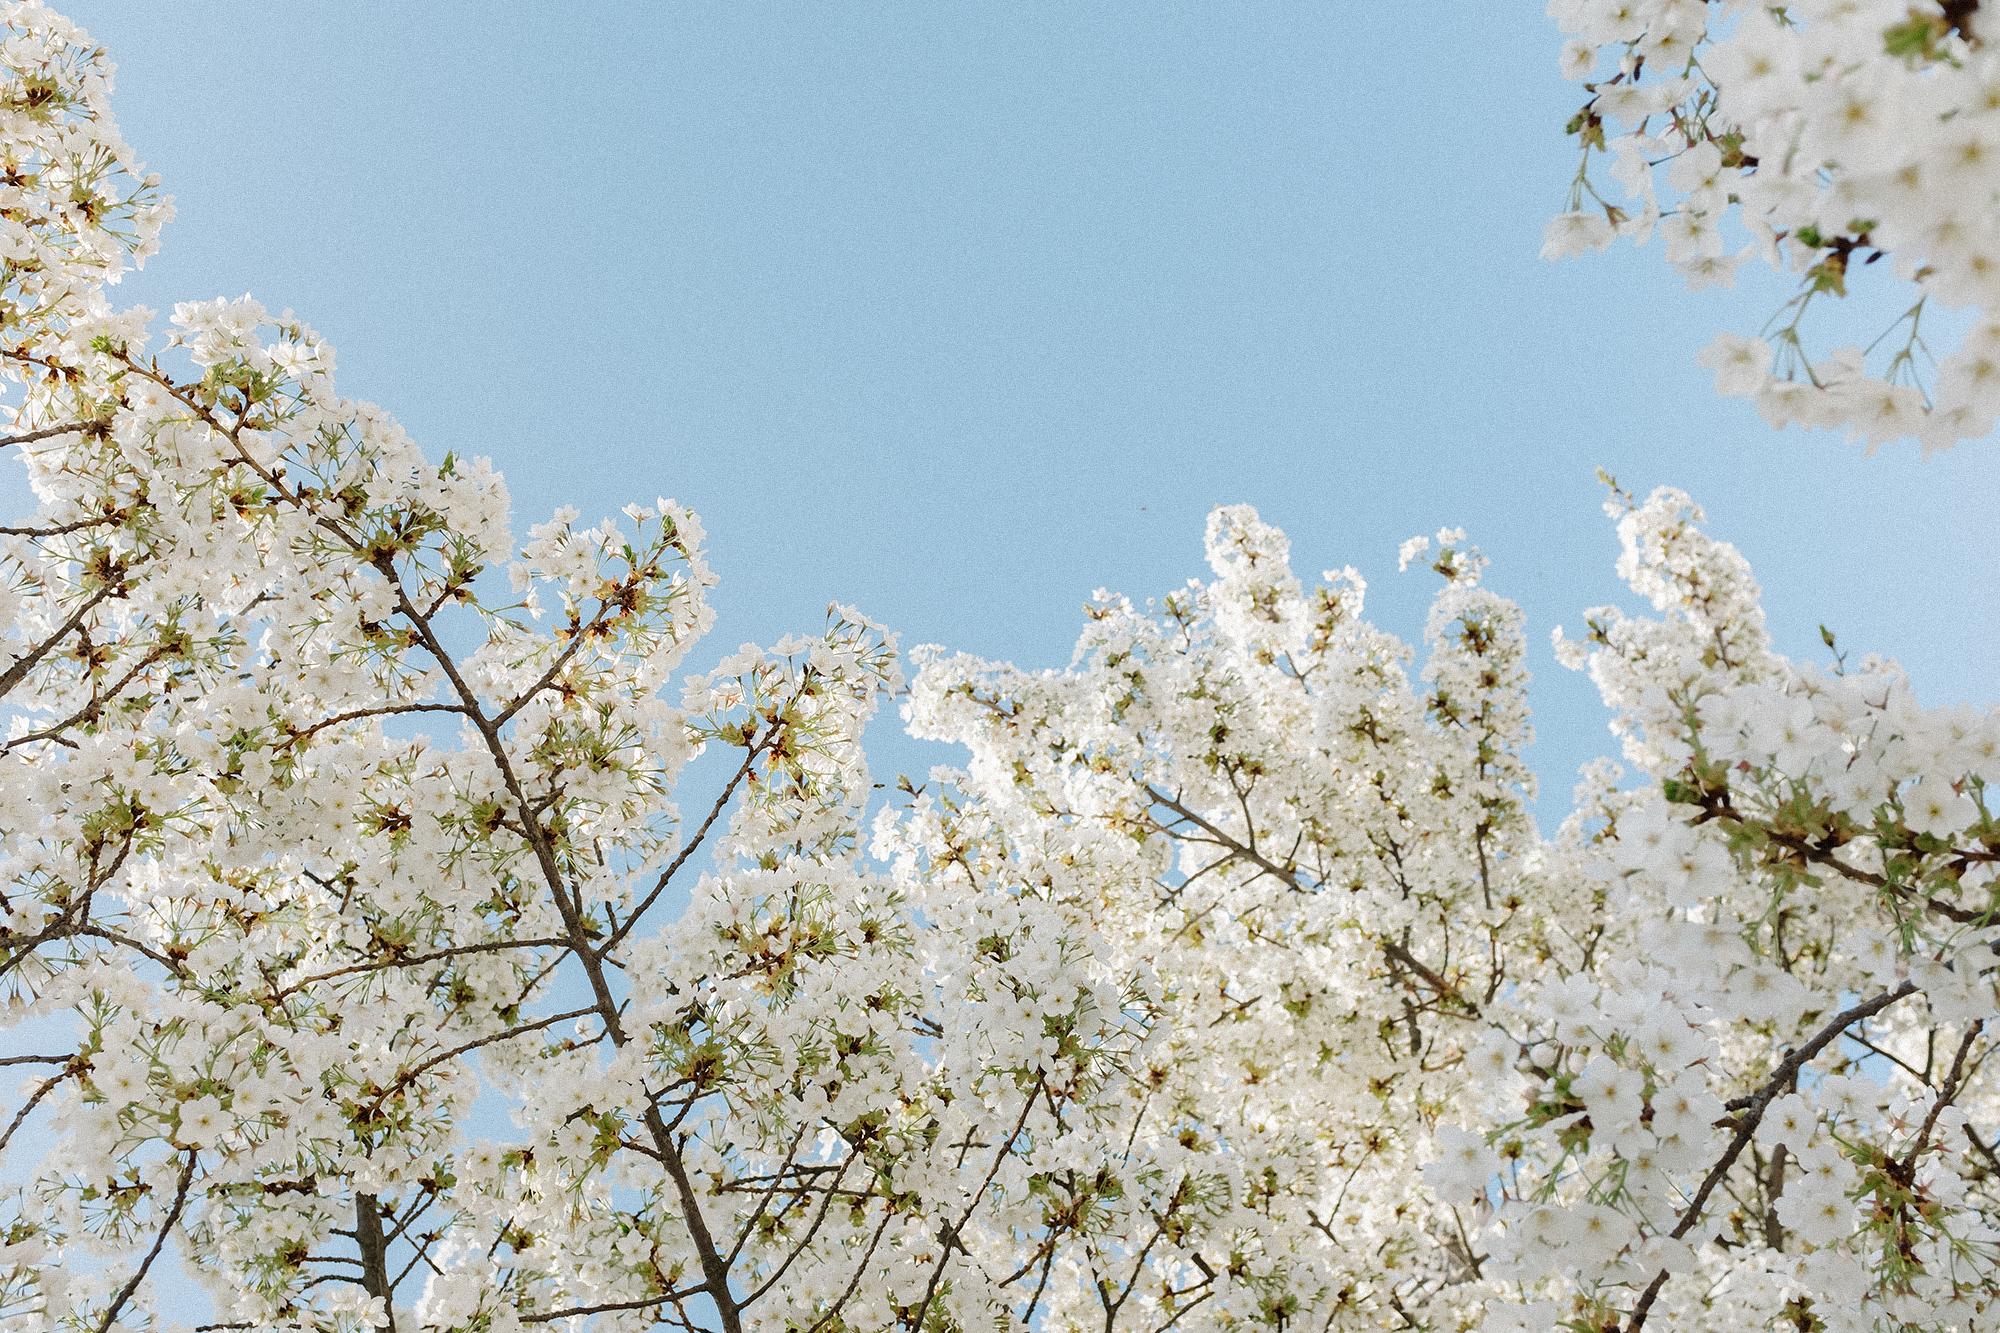 Paris_Spring_CarinOlsson01.jpg